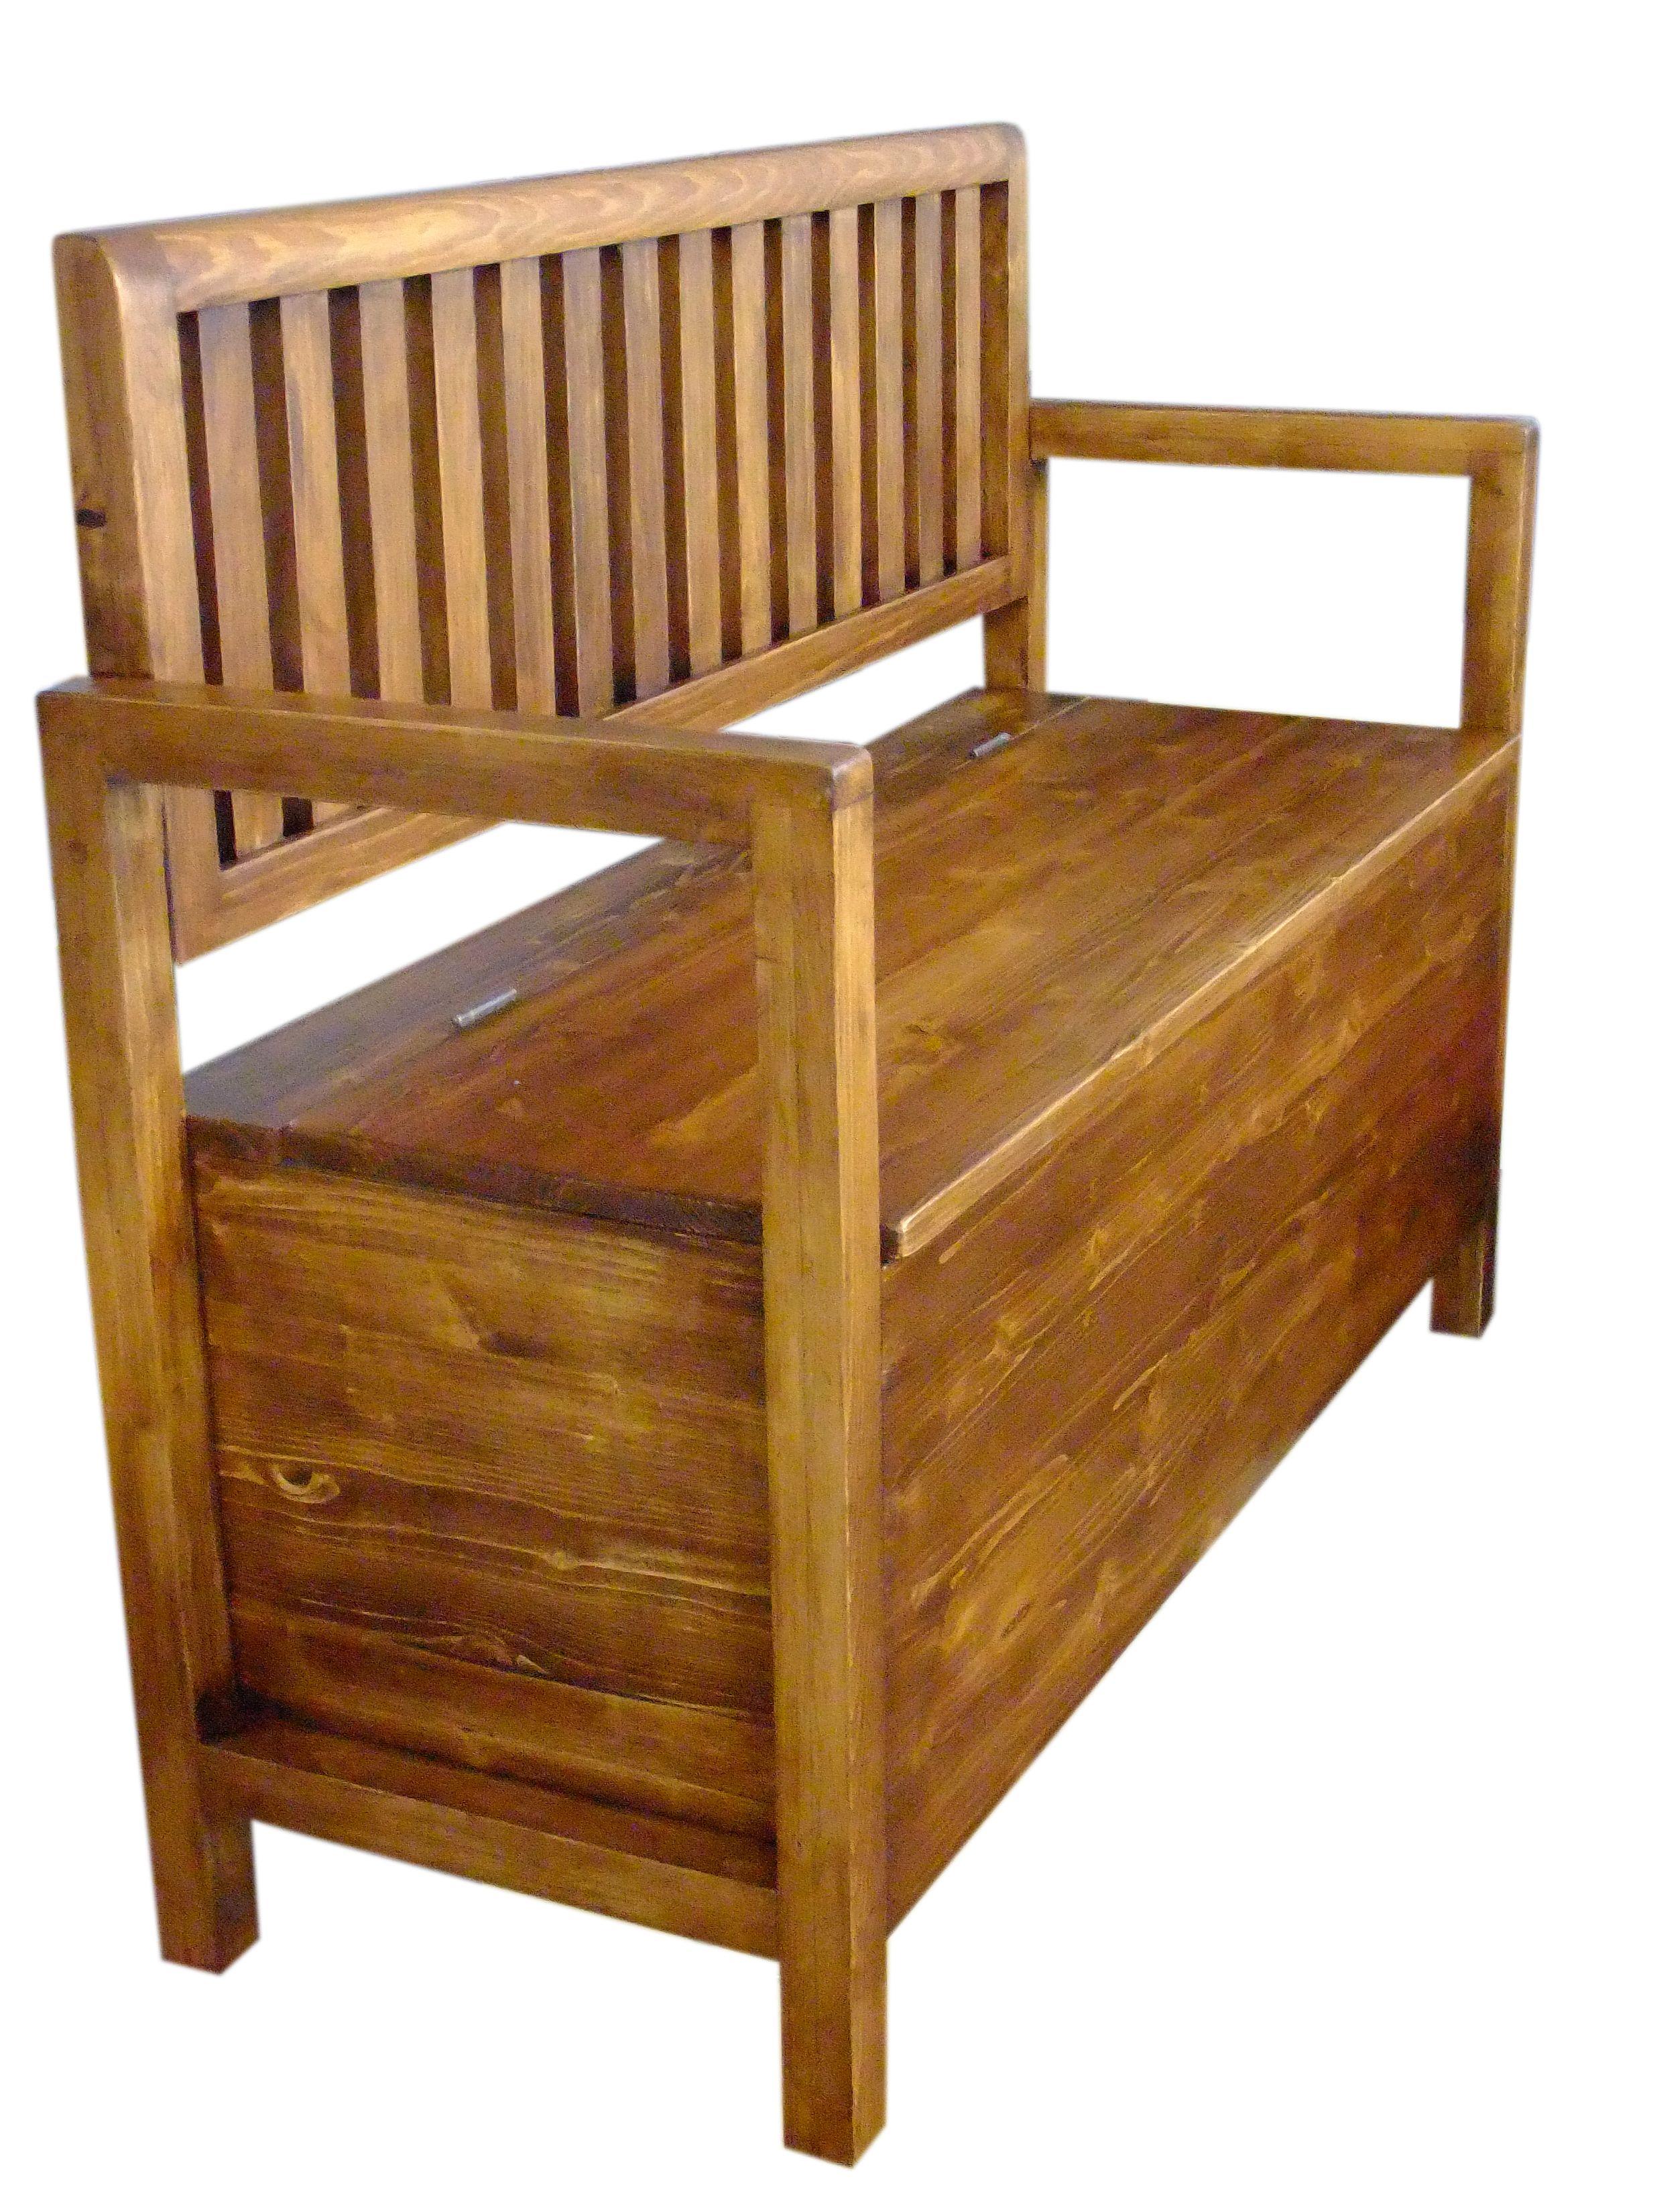 Strange Deacons Bench This Original Beaglehouse Design Is 42 Long Inzonedesignstudio Interior Chair Design Inzonedesignstudiocom